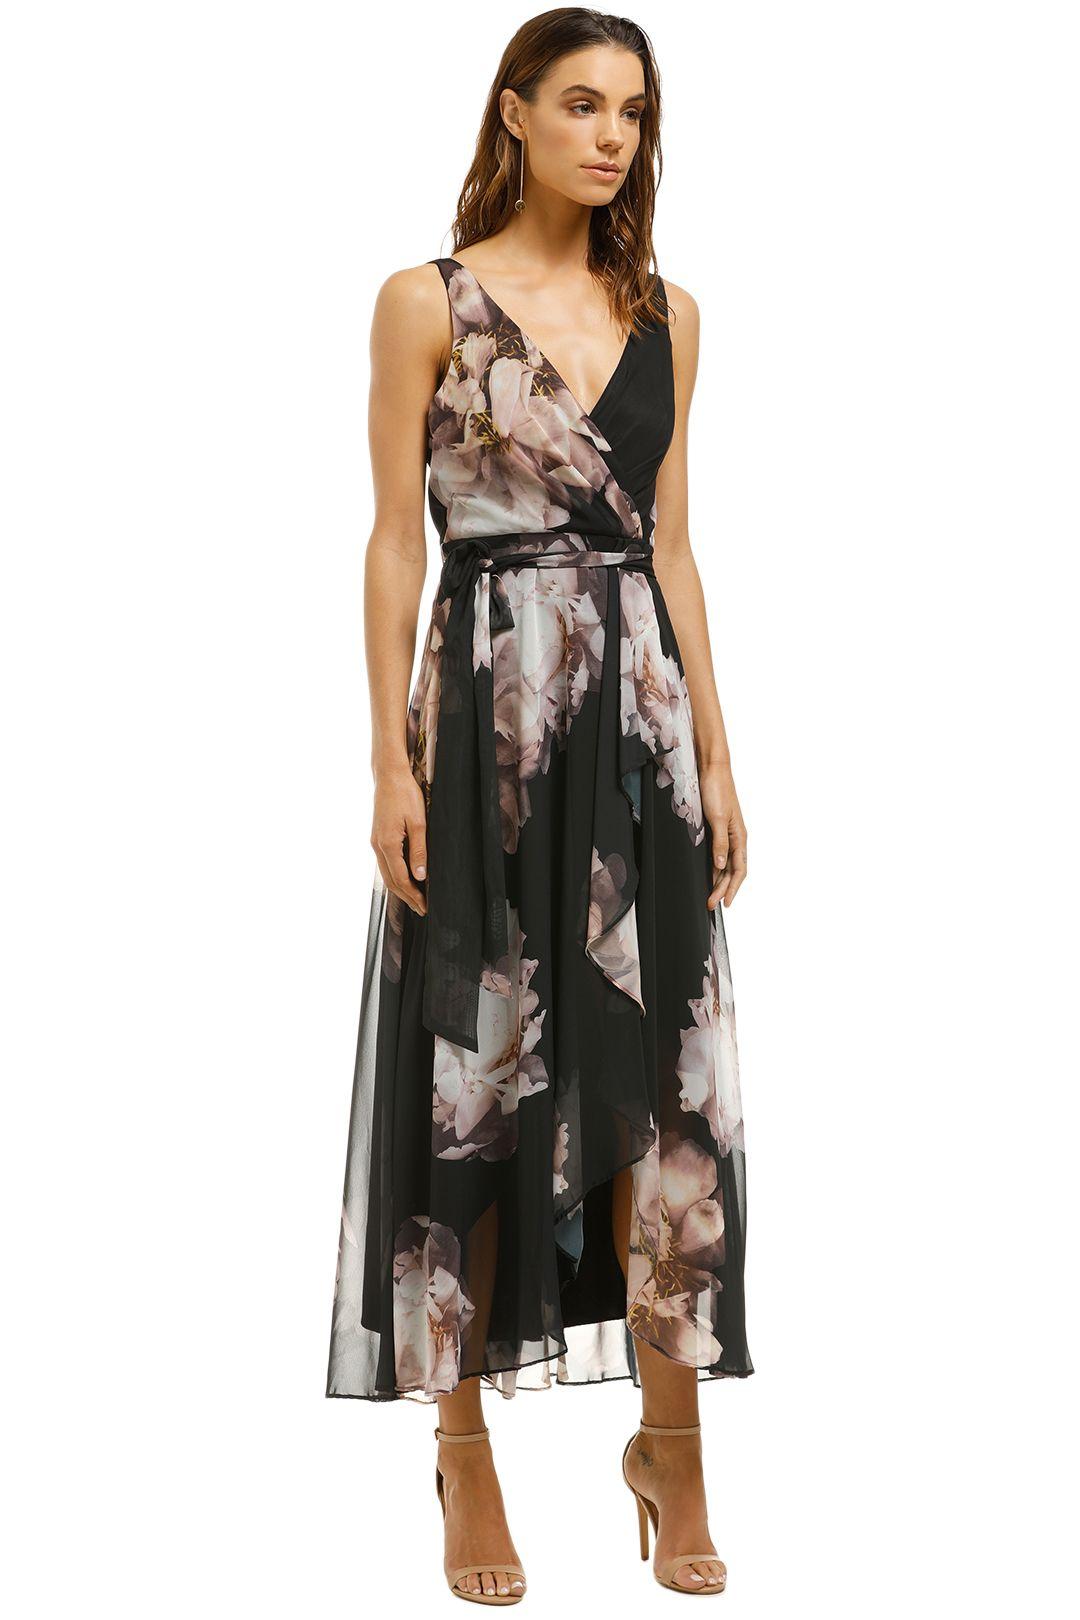 Montique-Rosie-Black-Print-Chiffon-Dress-Black-Floral-Side